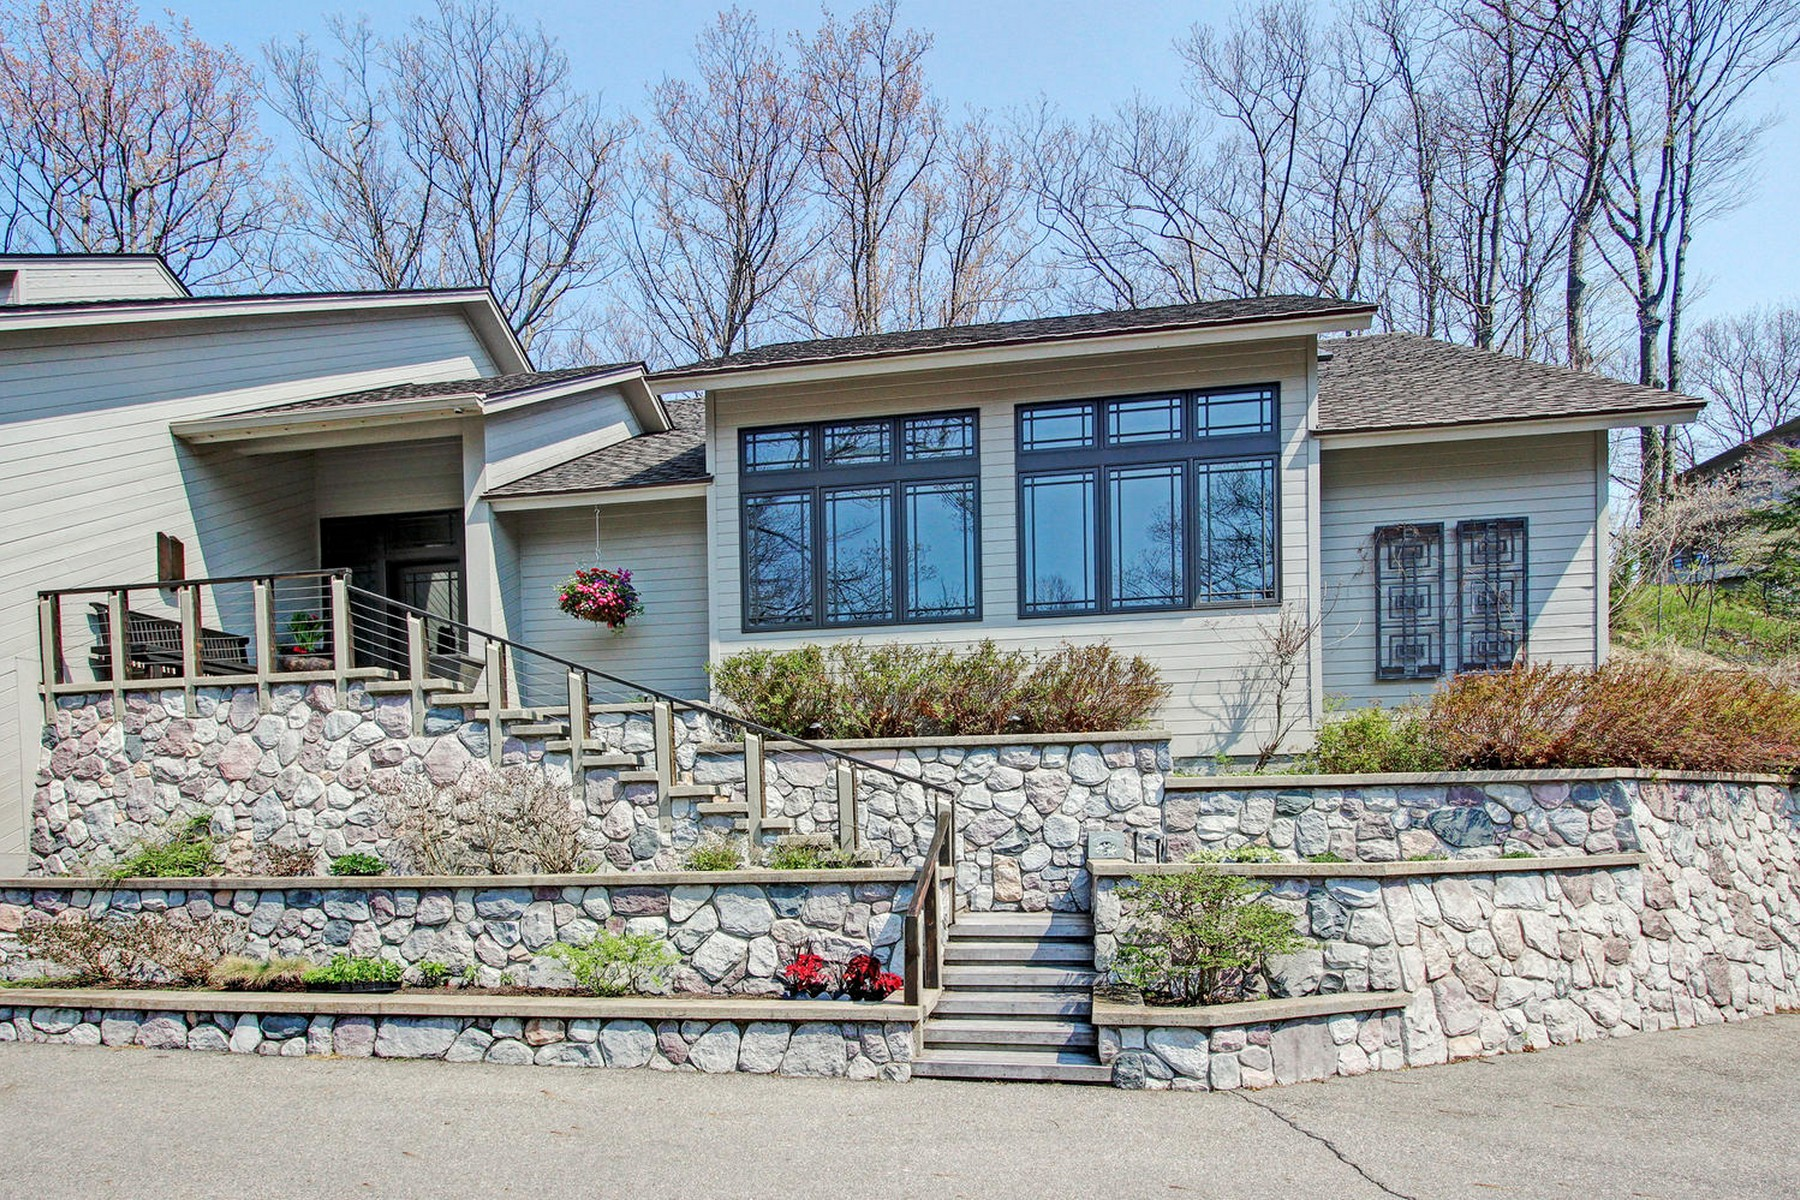 獨棟家庭住宅 為 出售 在 One Of A Kind Lake Michigan Home! 6685 Sunset Concourse Holland, 密歇根州, 49423 美國